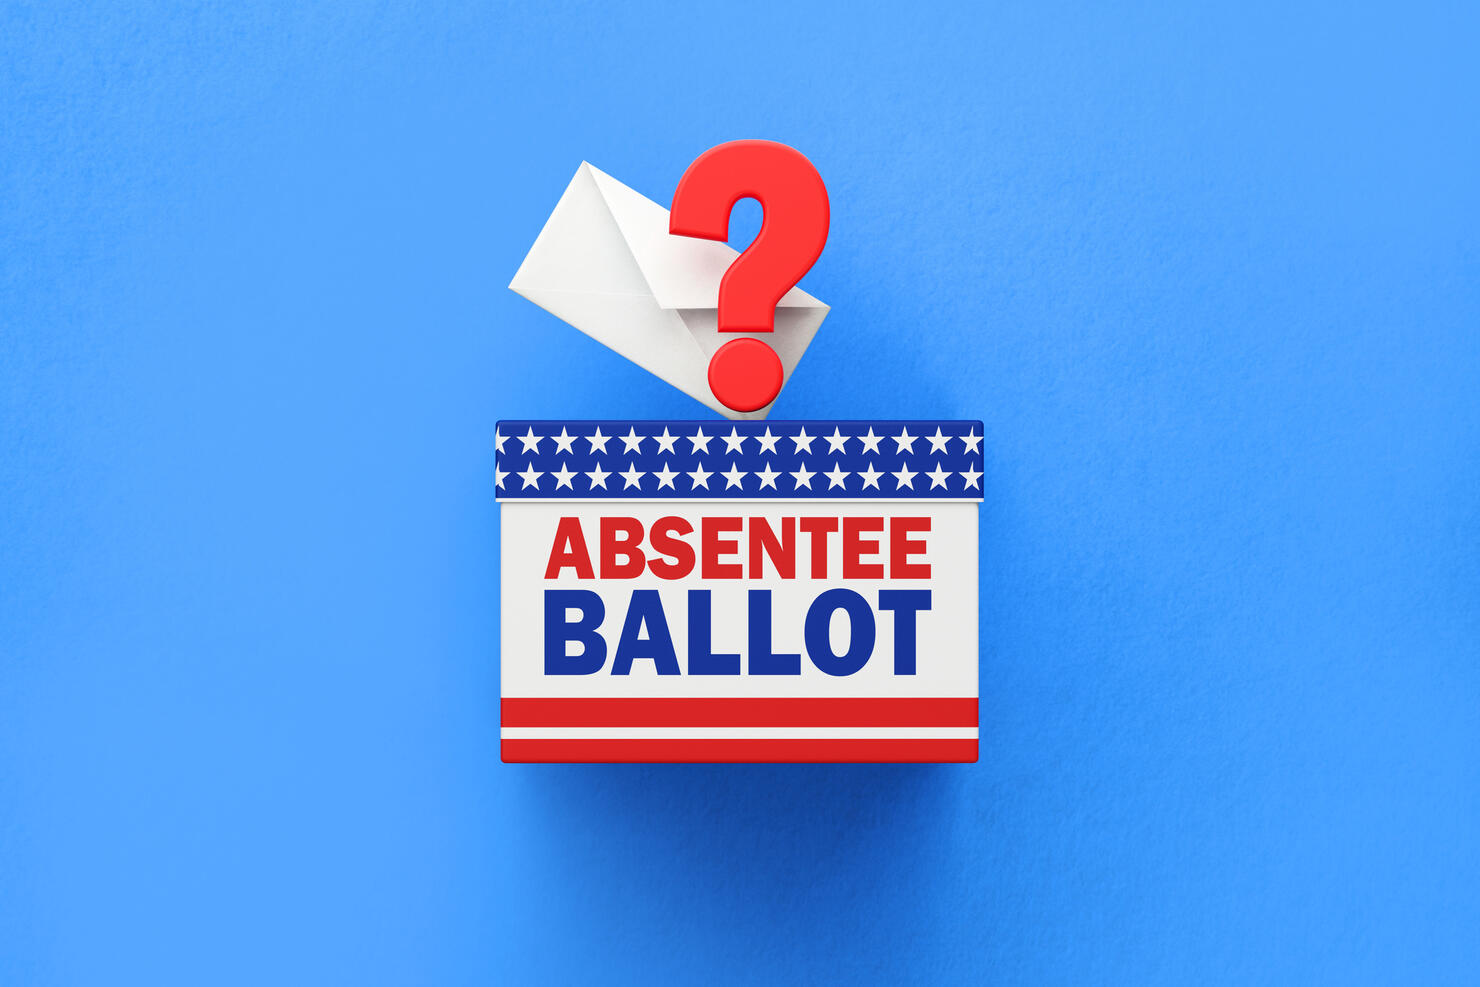 GETTY IMAGE: Absentee Ballot Written Ballot Box and White Vote Envelope Sitting on White Background